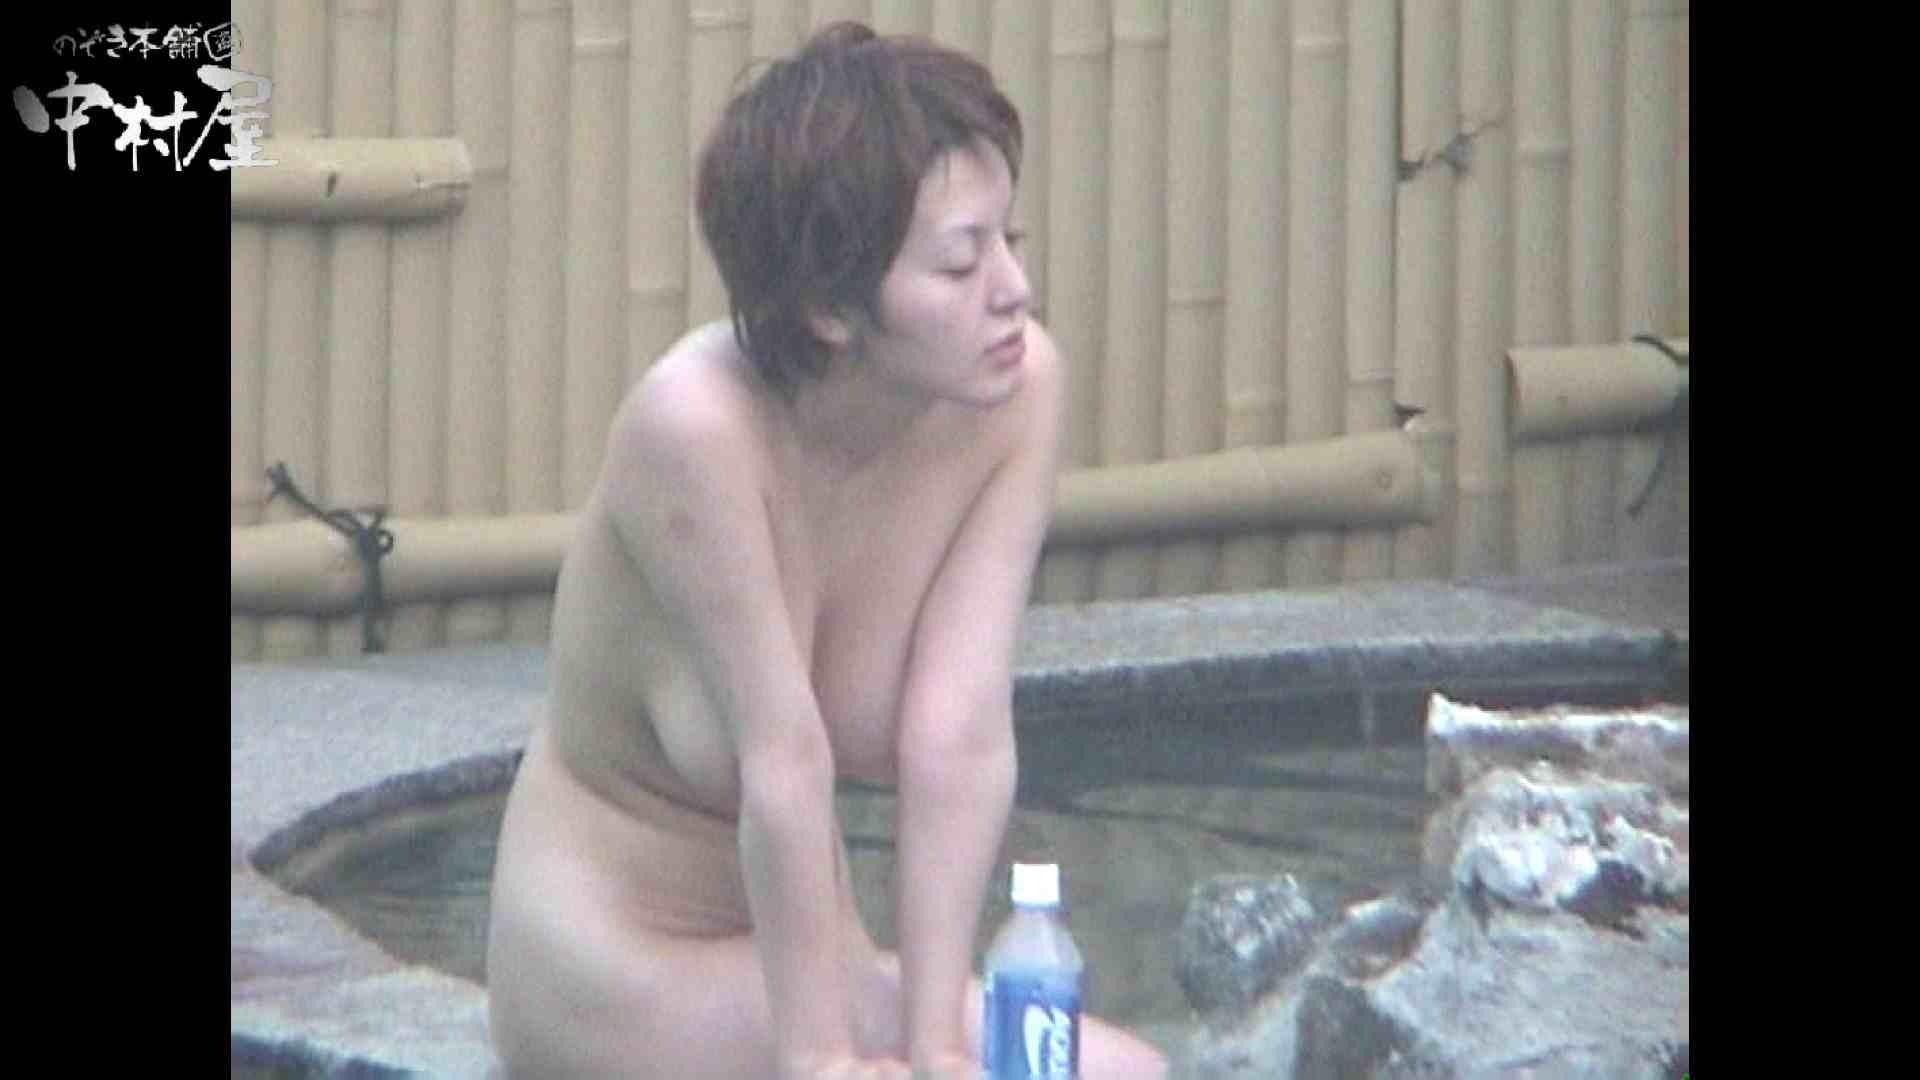 Aquaな露天風呂Vol.959 OLのプライベート   盗撮特撮  13pic 10